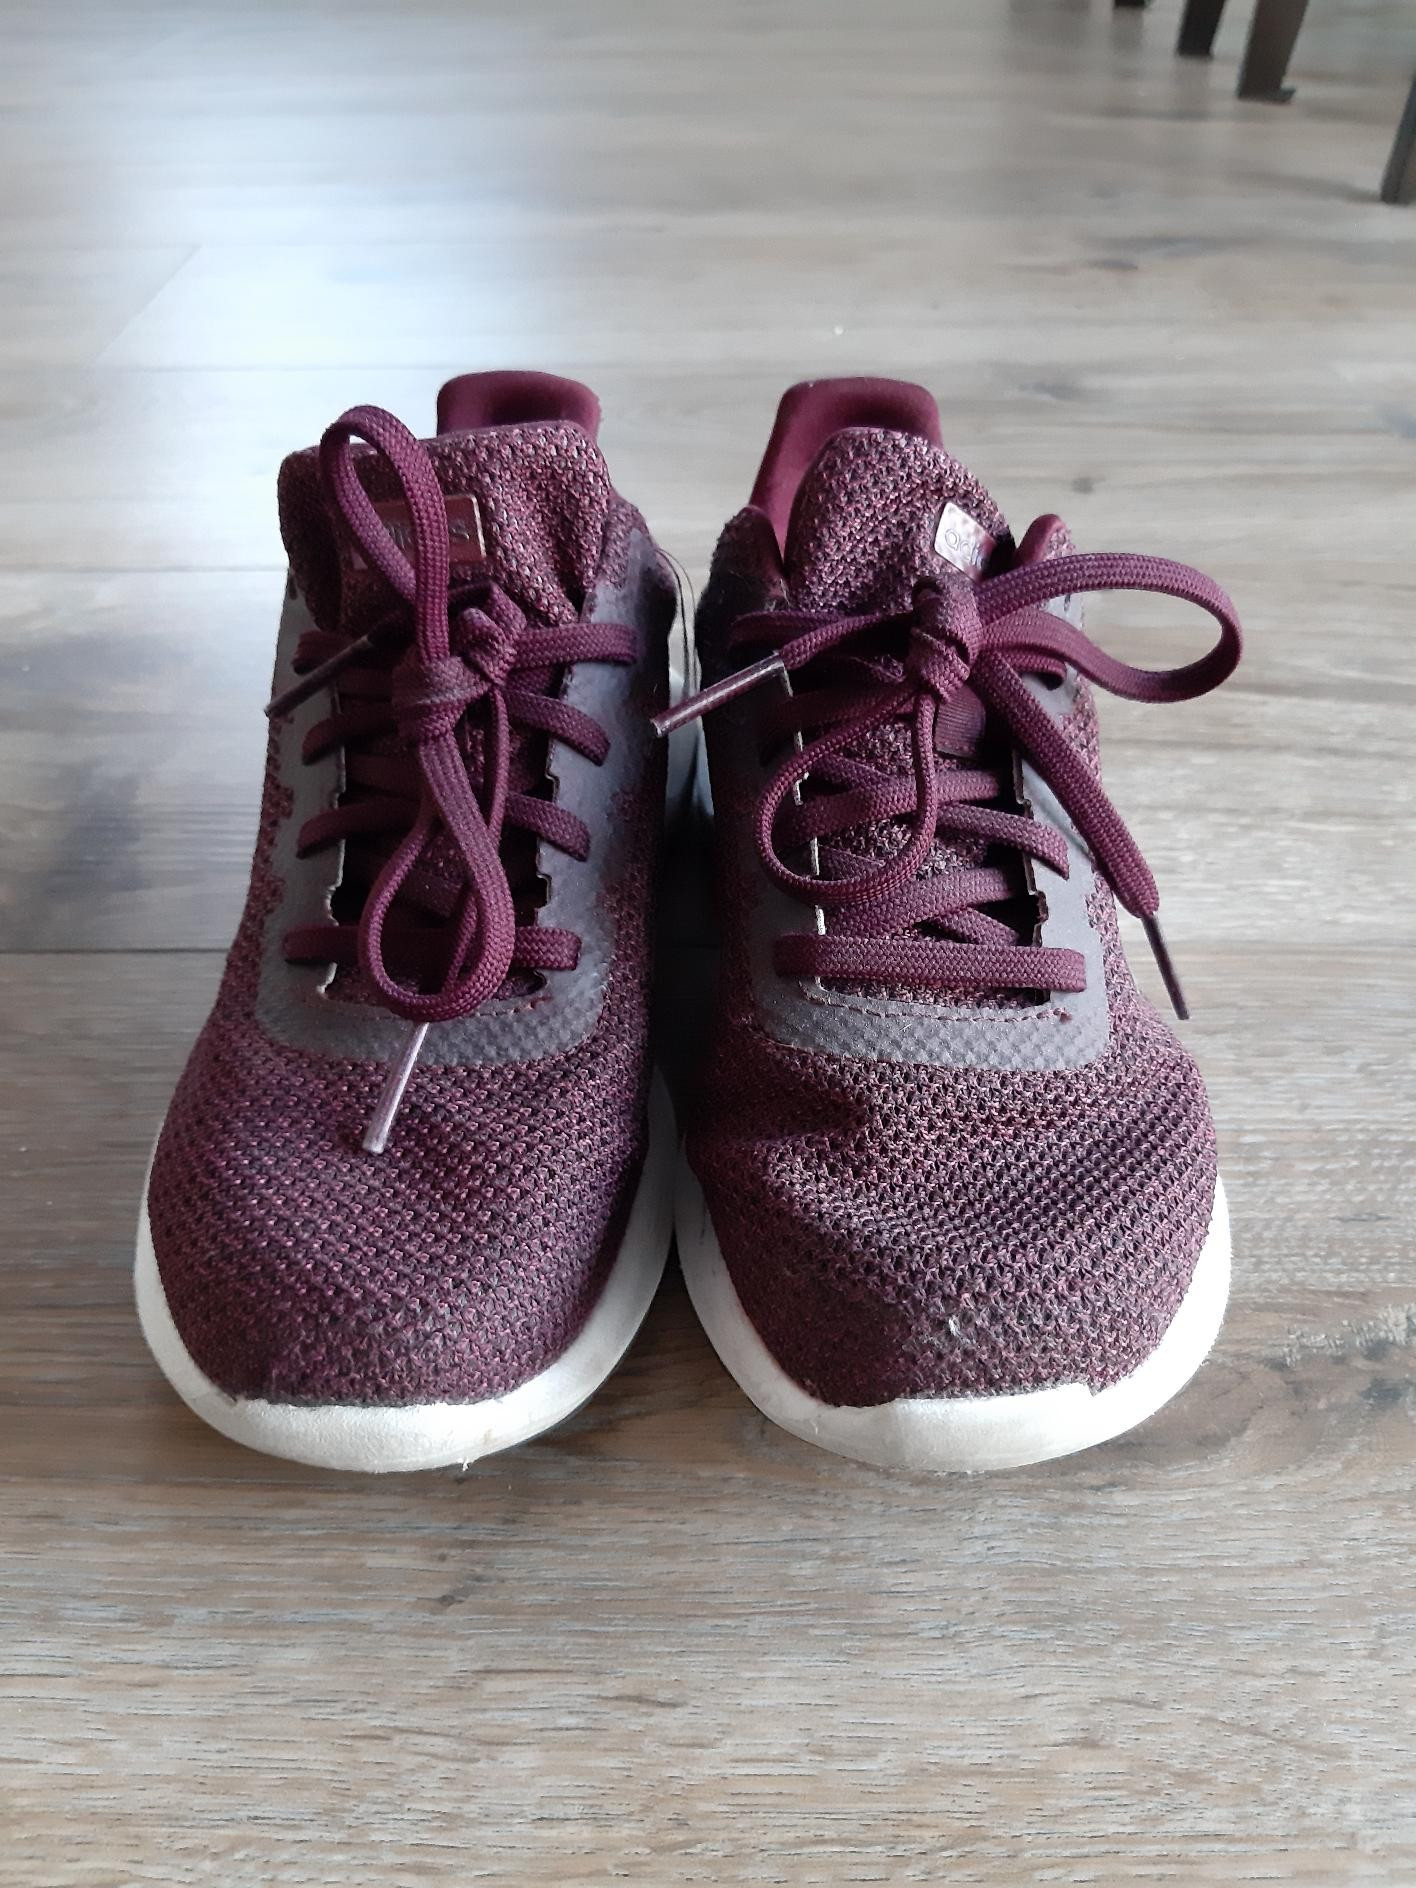 Pent brukte Adidas sko, str 37 13 | FINN.no